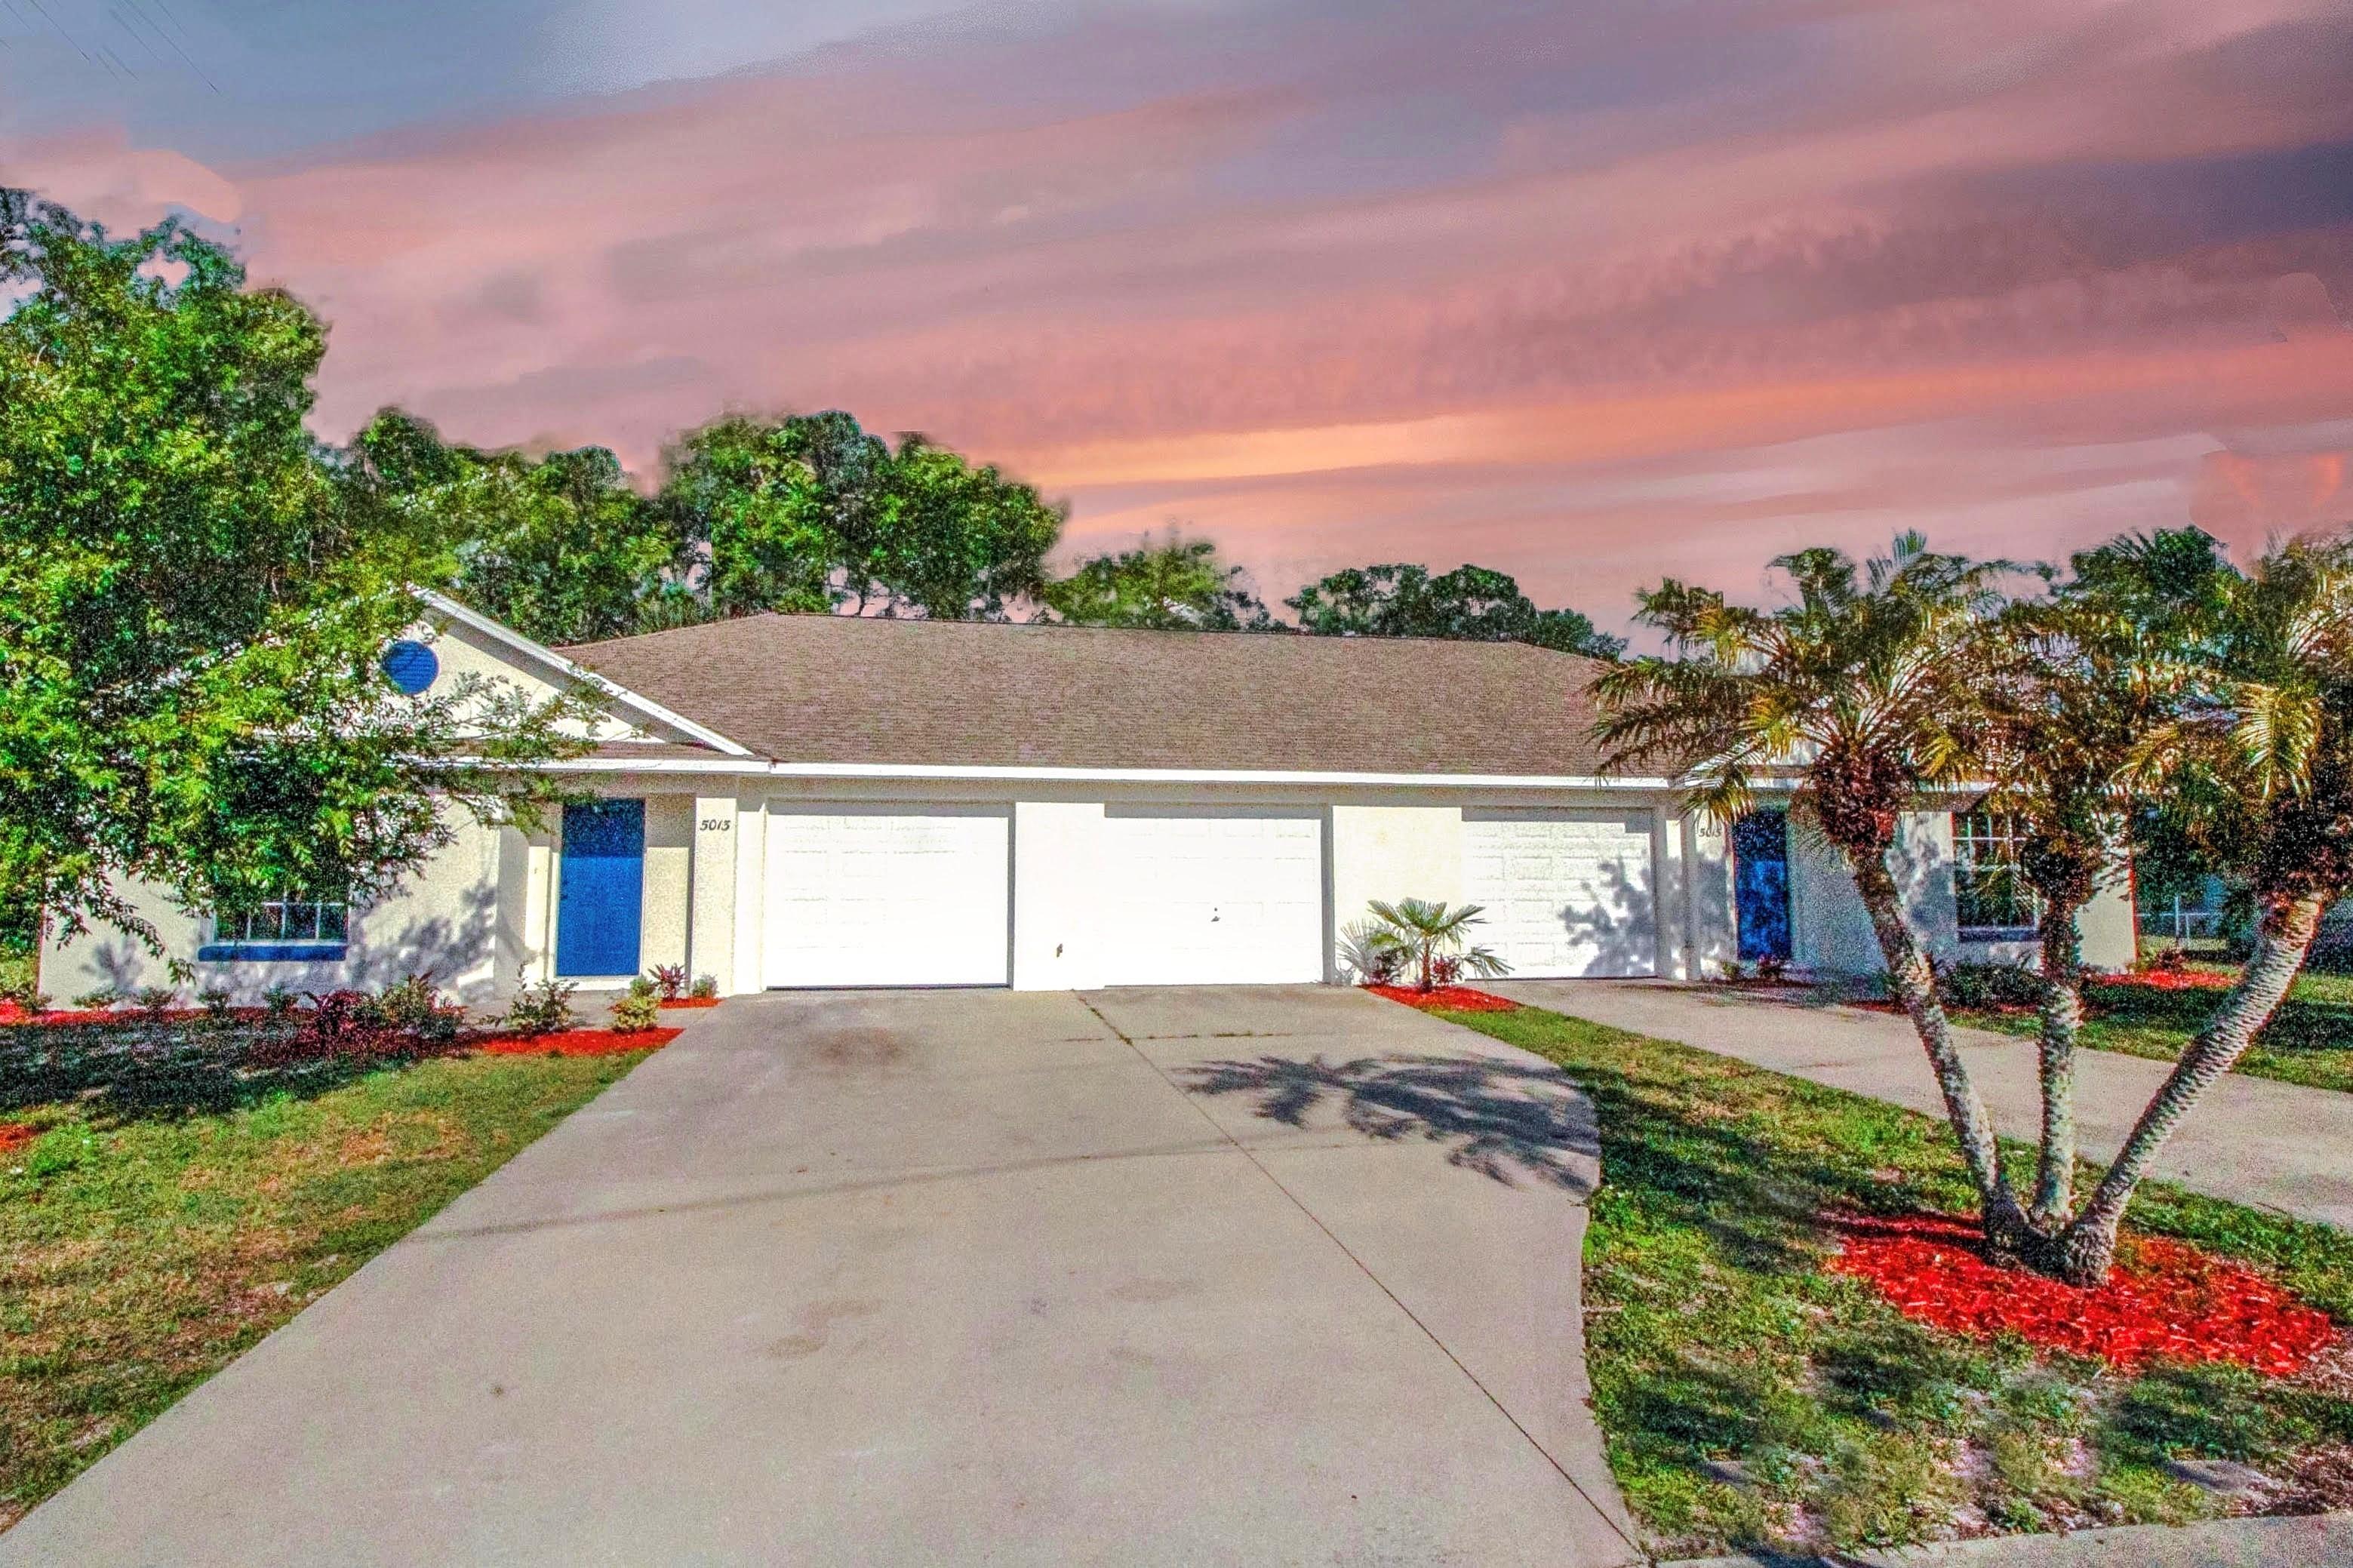 Daytona Beach Area Duplex For Sale